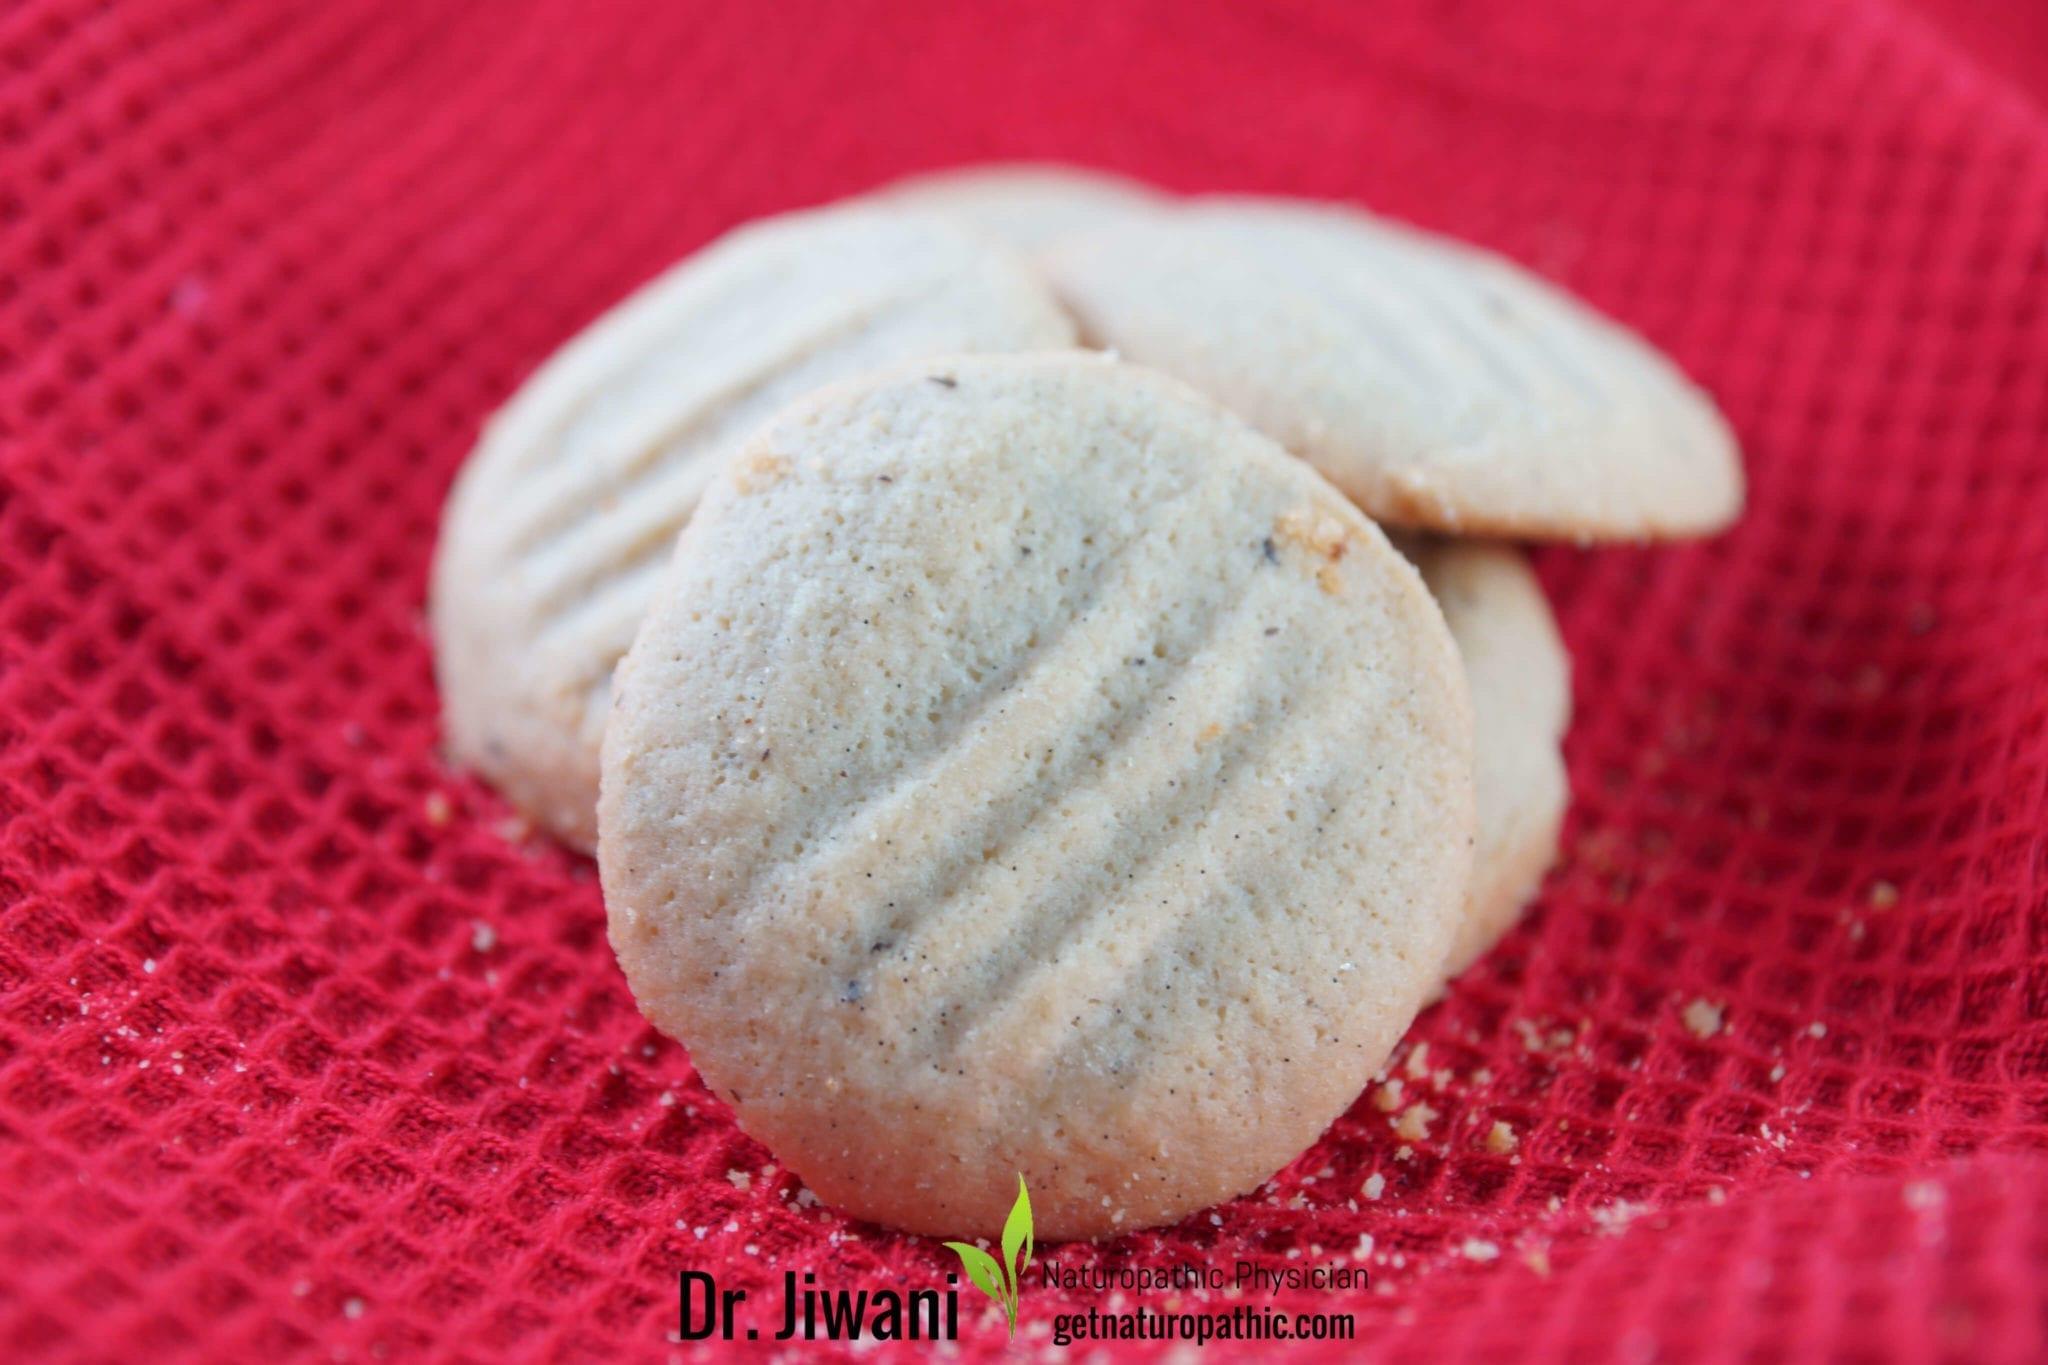 Recipe: Dr. Jiwani's Keto Vegan Shortbread Cookies 9 | Dr. Jiwani's Naturopathic Nuggets Blog